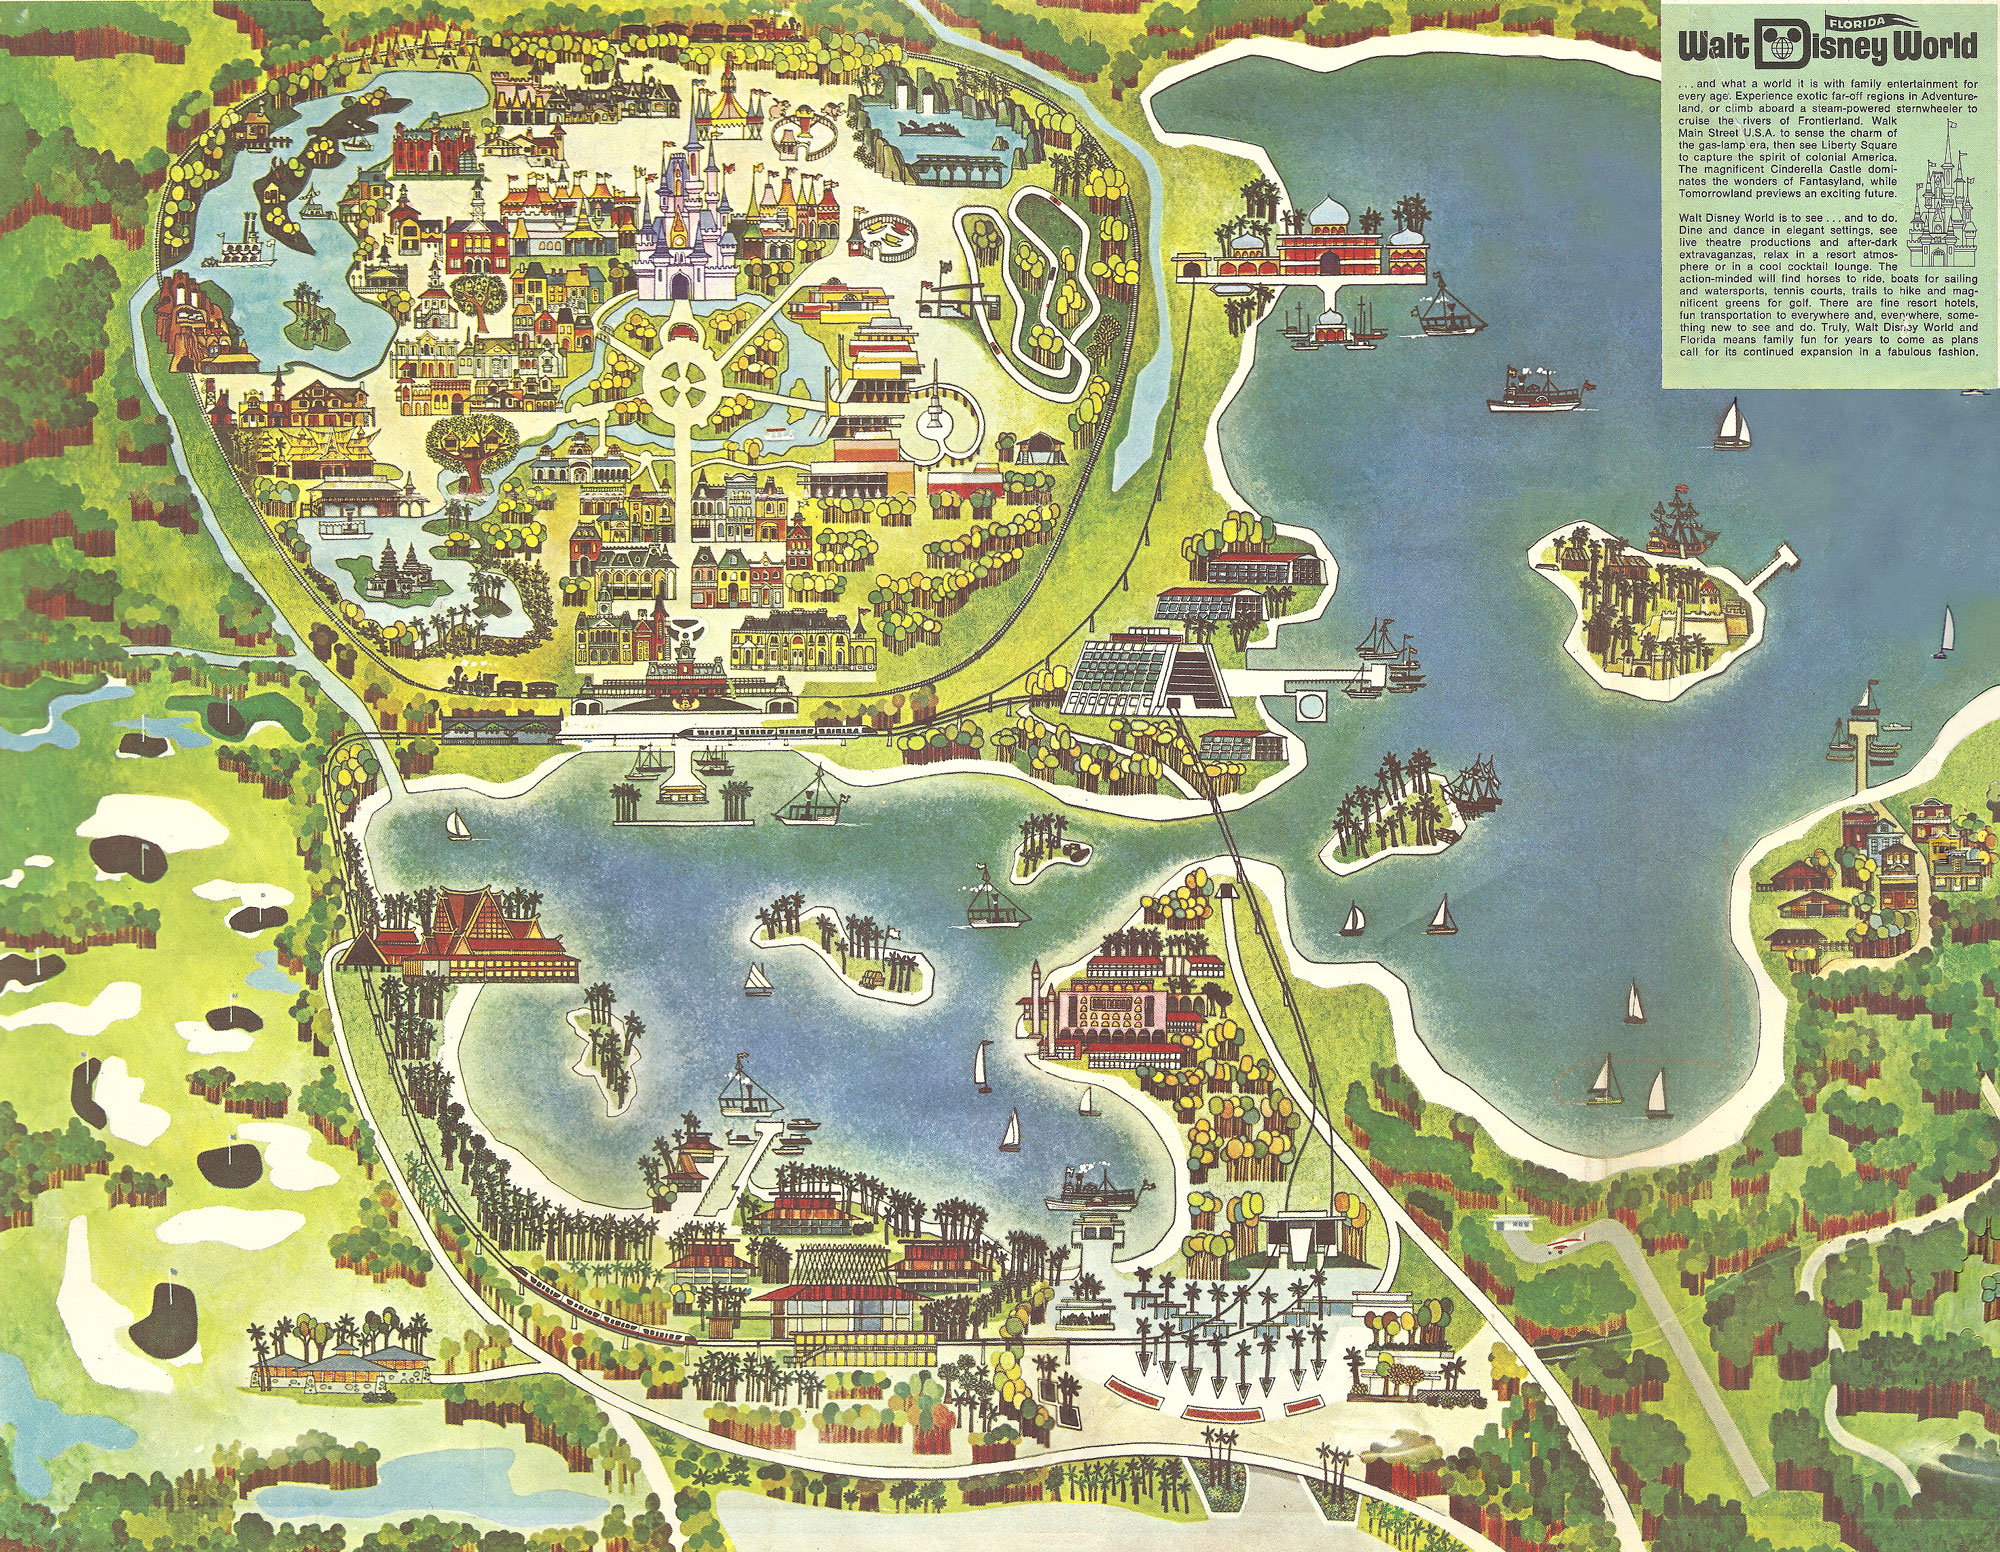 Walt Disney World Map